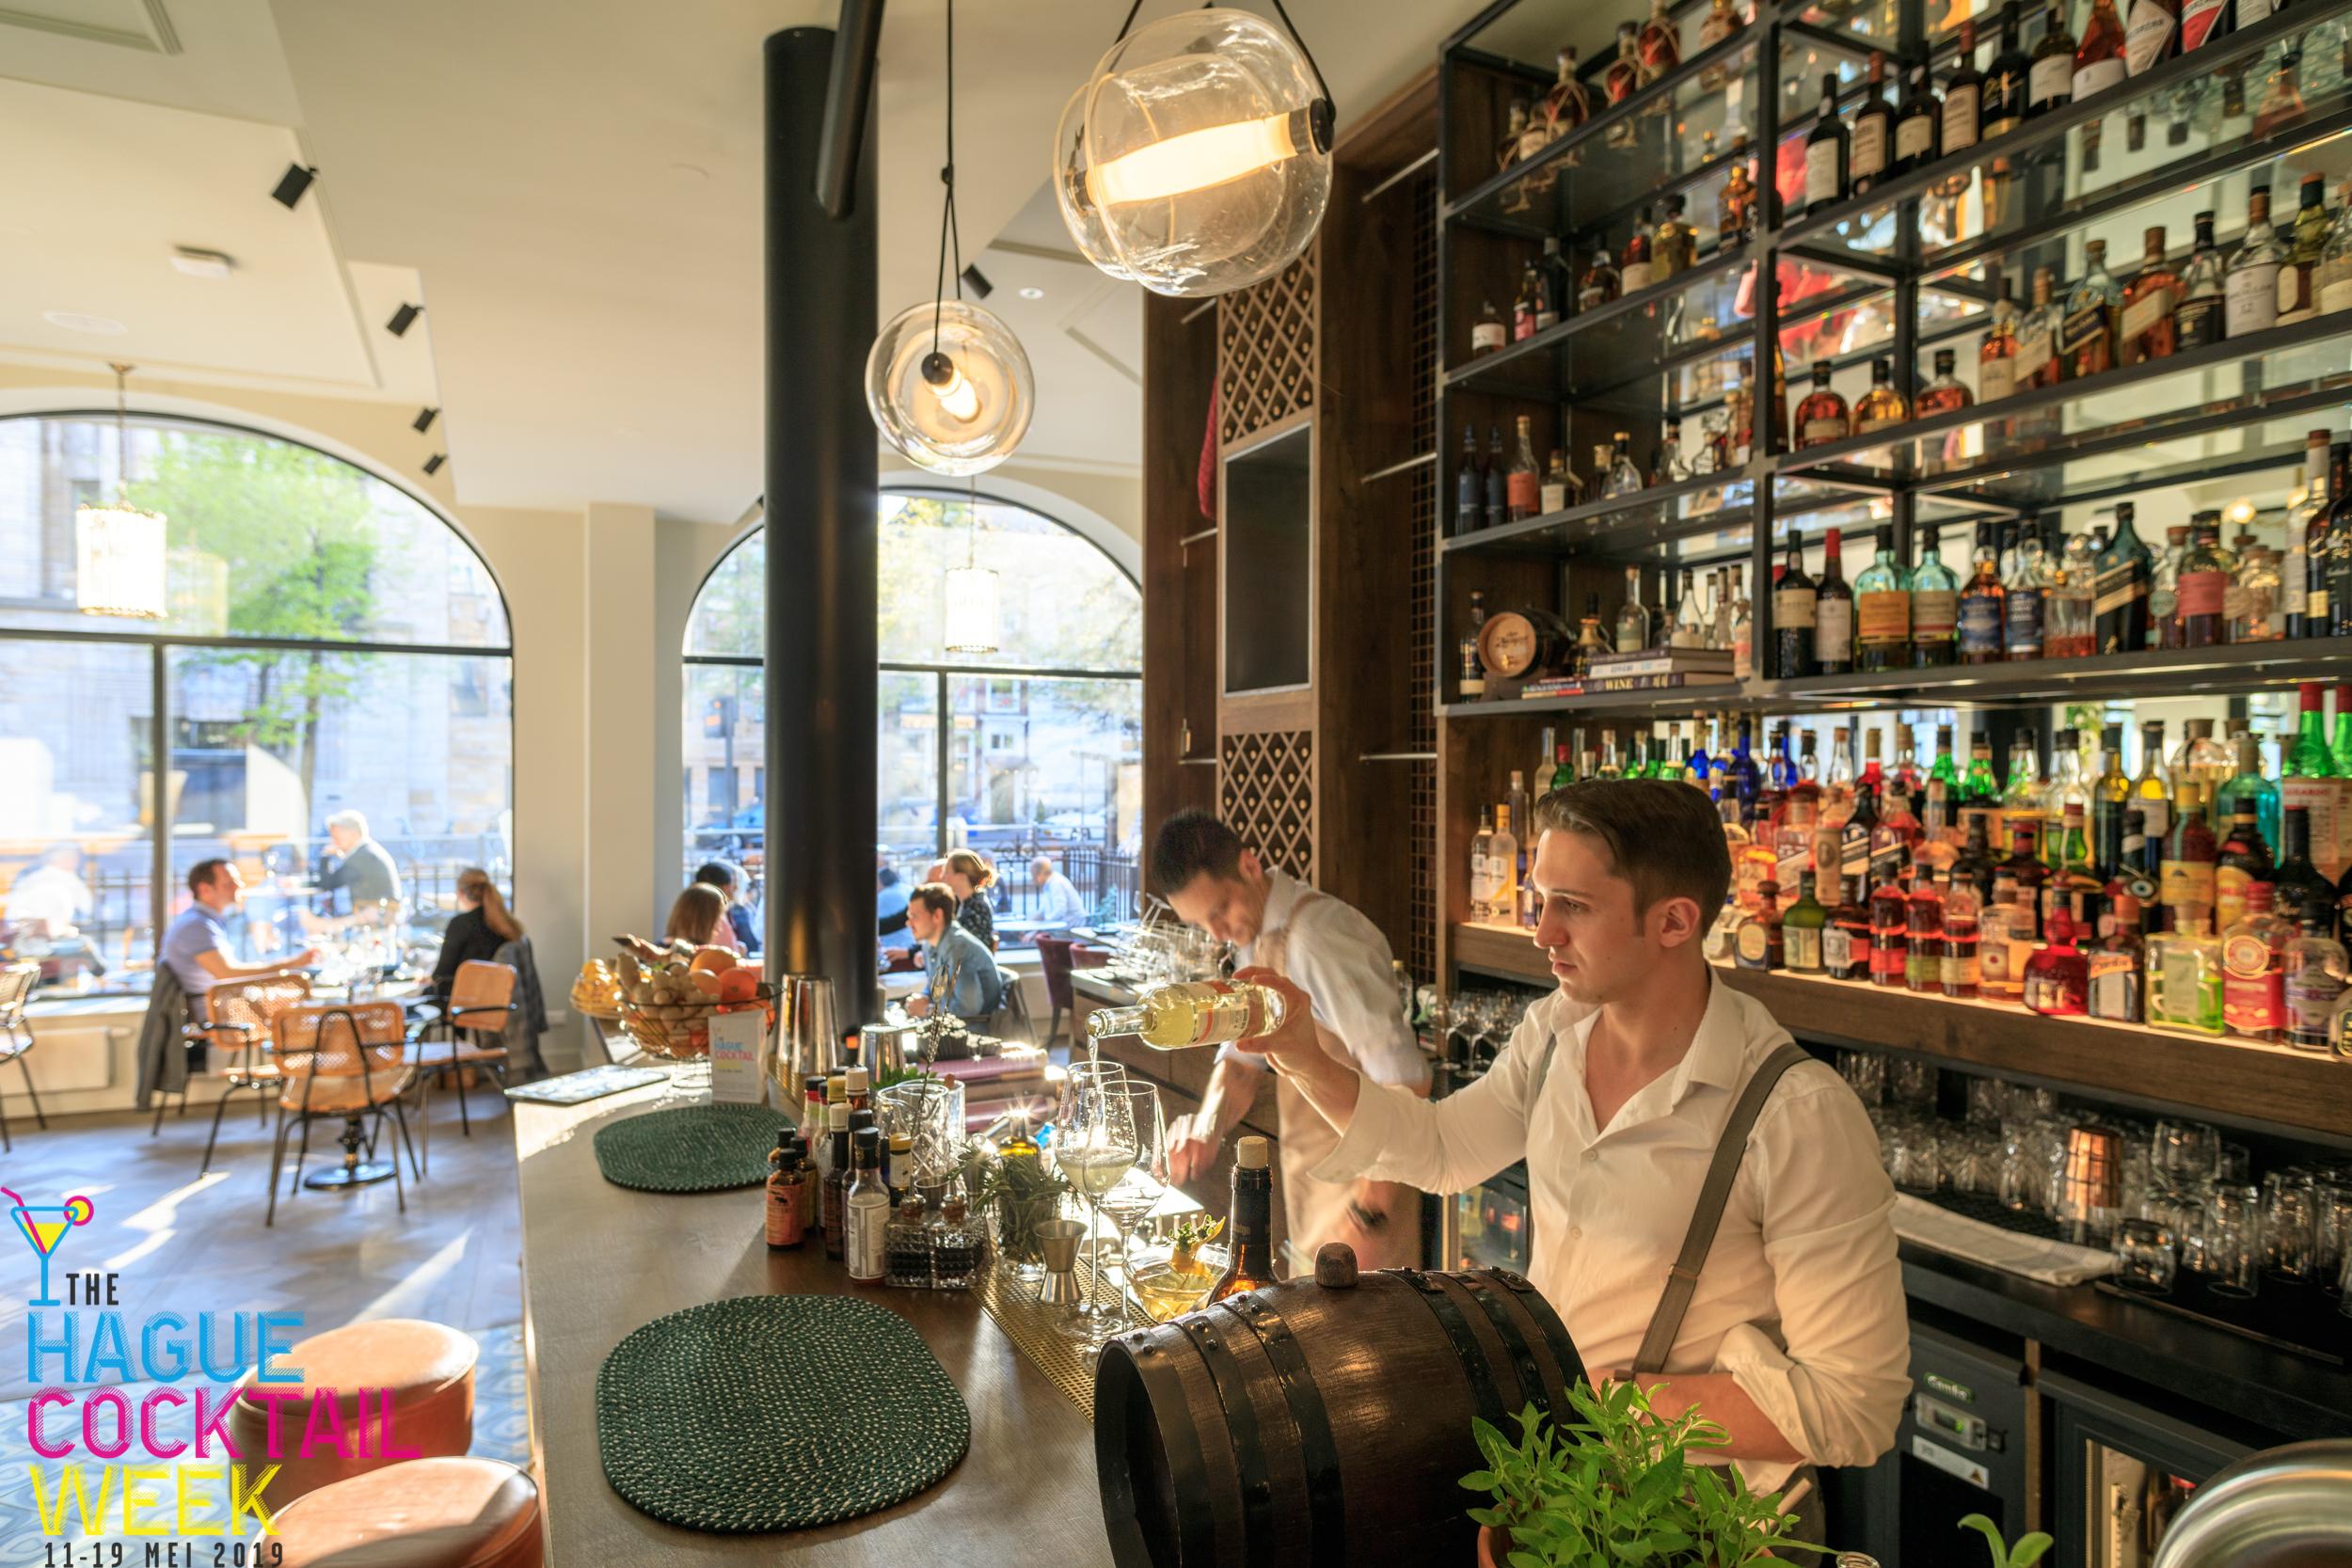 Tapisco | The Hague Cocktailweek-4.jpg